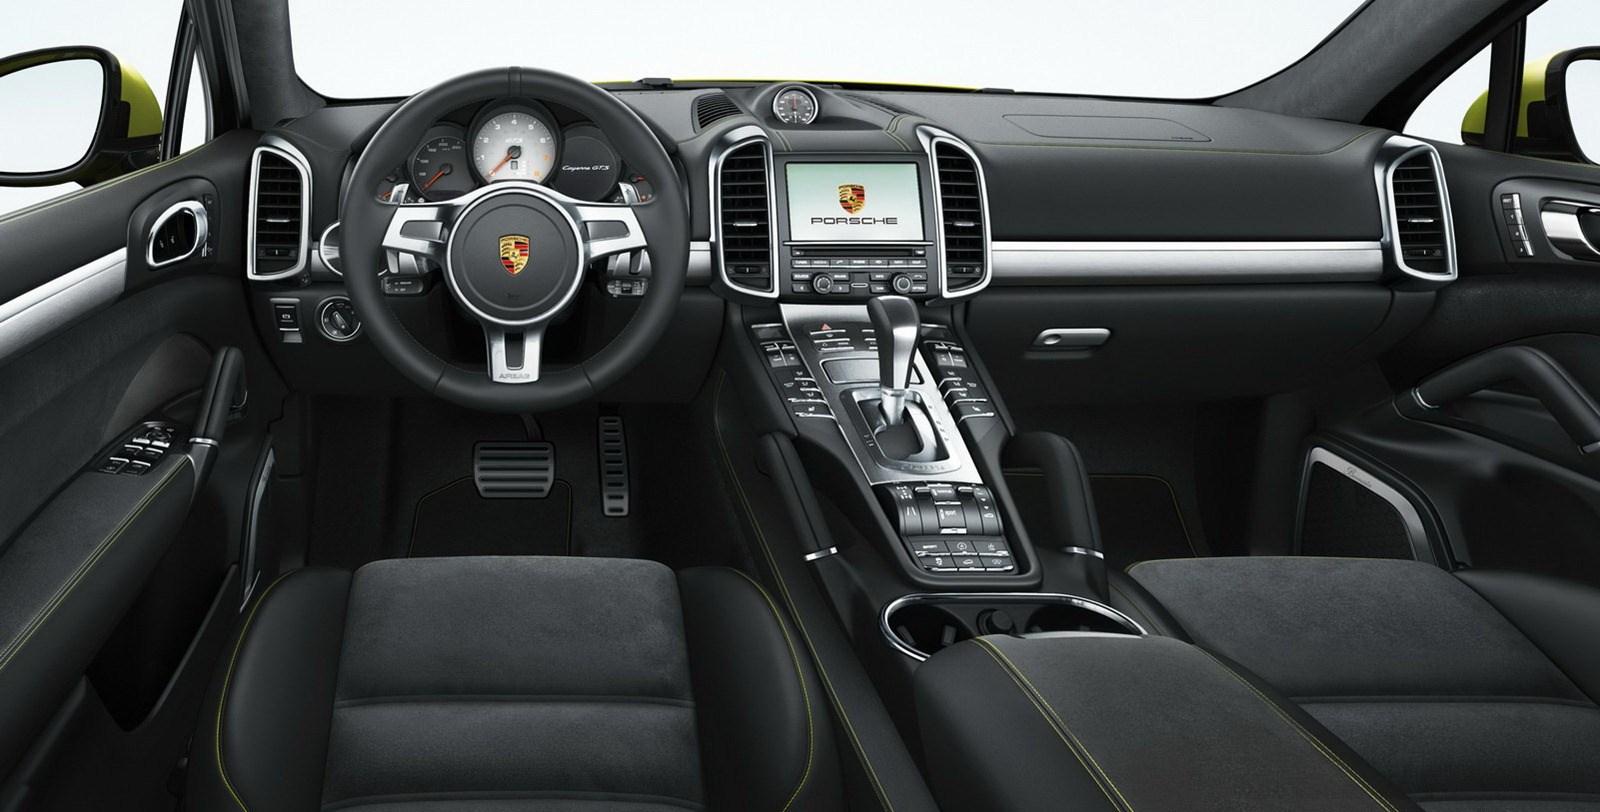 2013-Porsche-Cayenne-GTS-Interior-4 - ForceGT.com